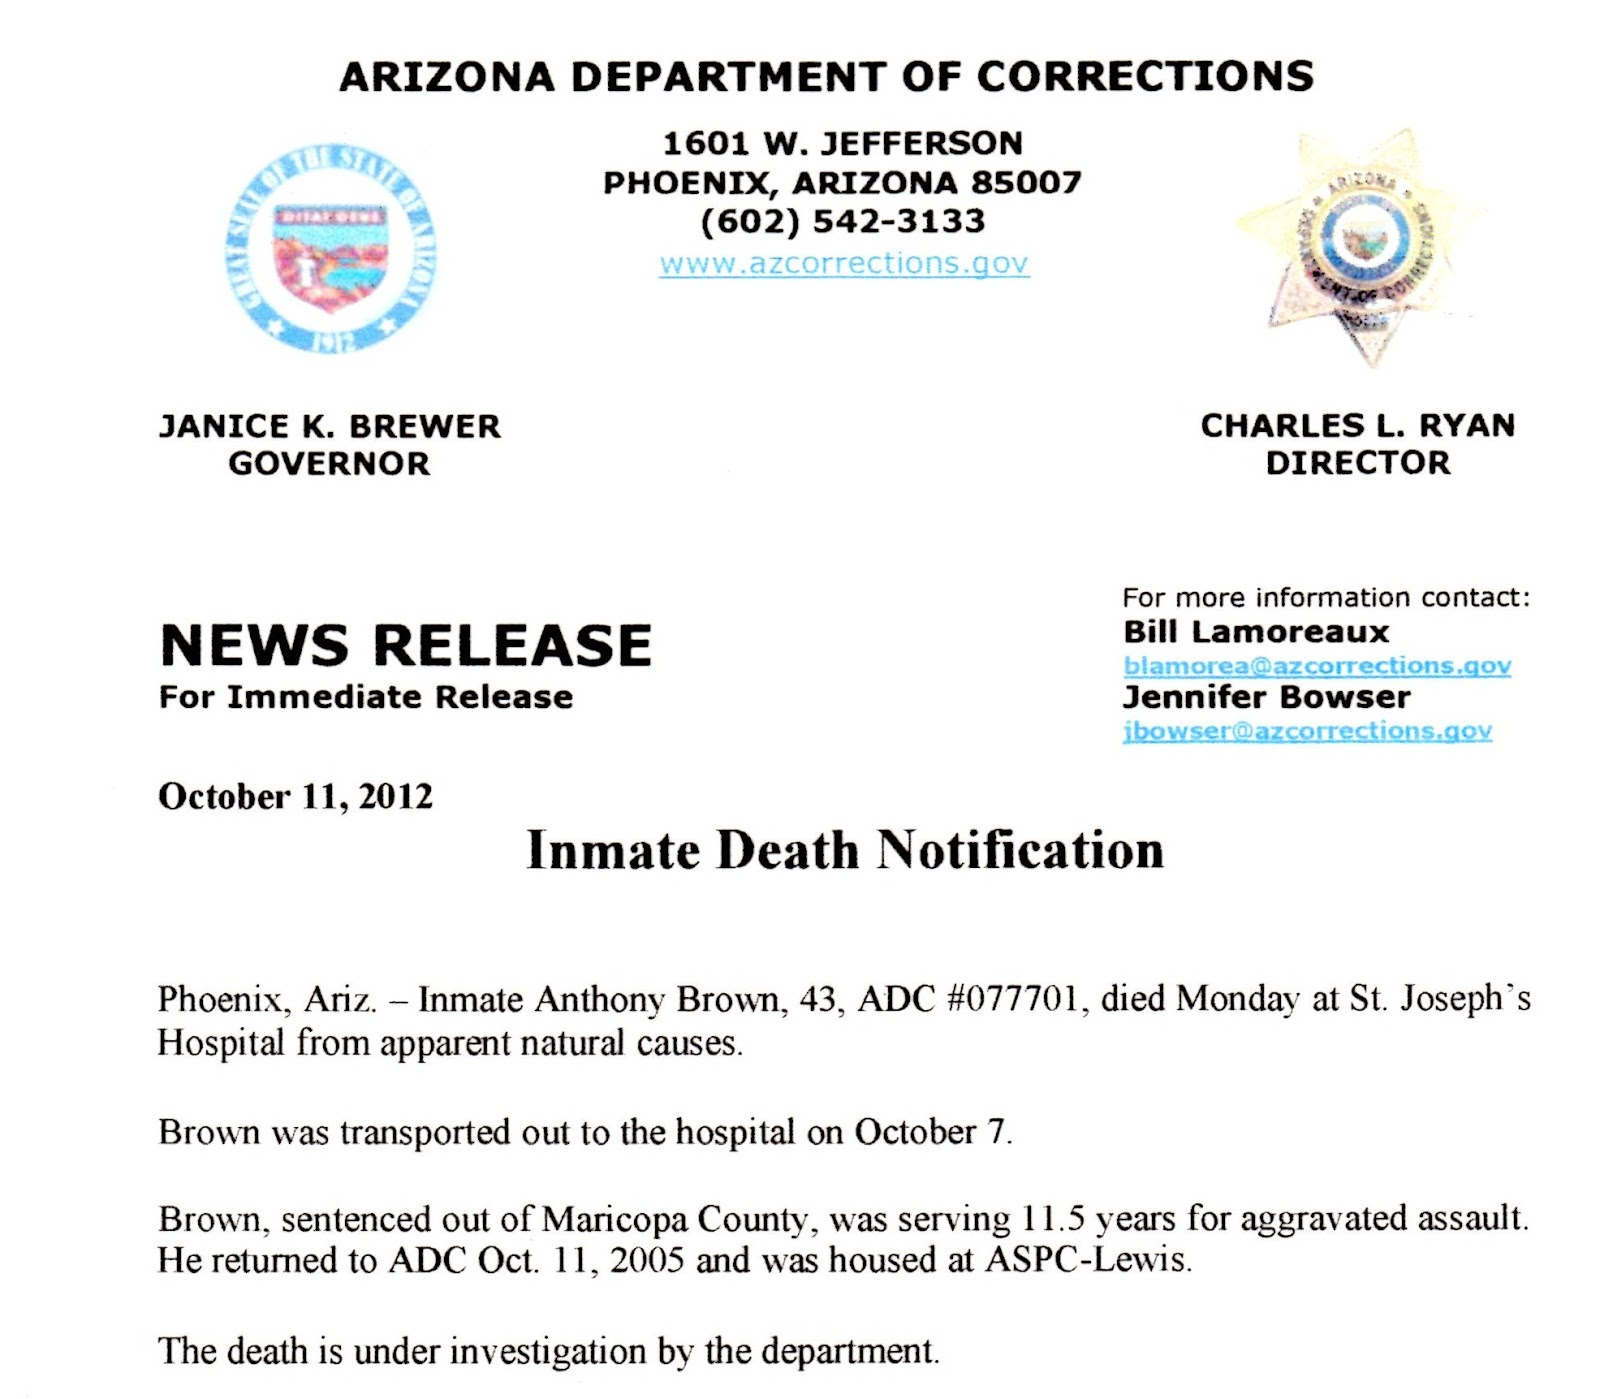 Survivors of Prison Violence - Arizona: October 2012